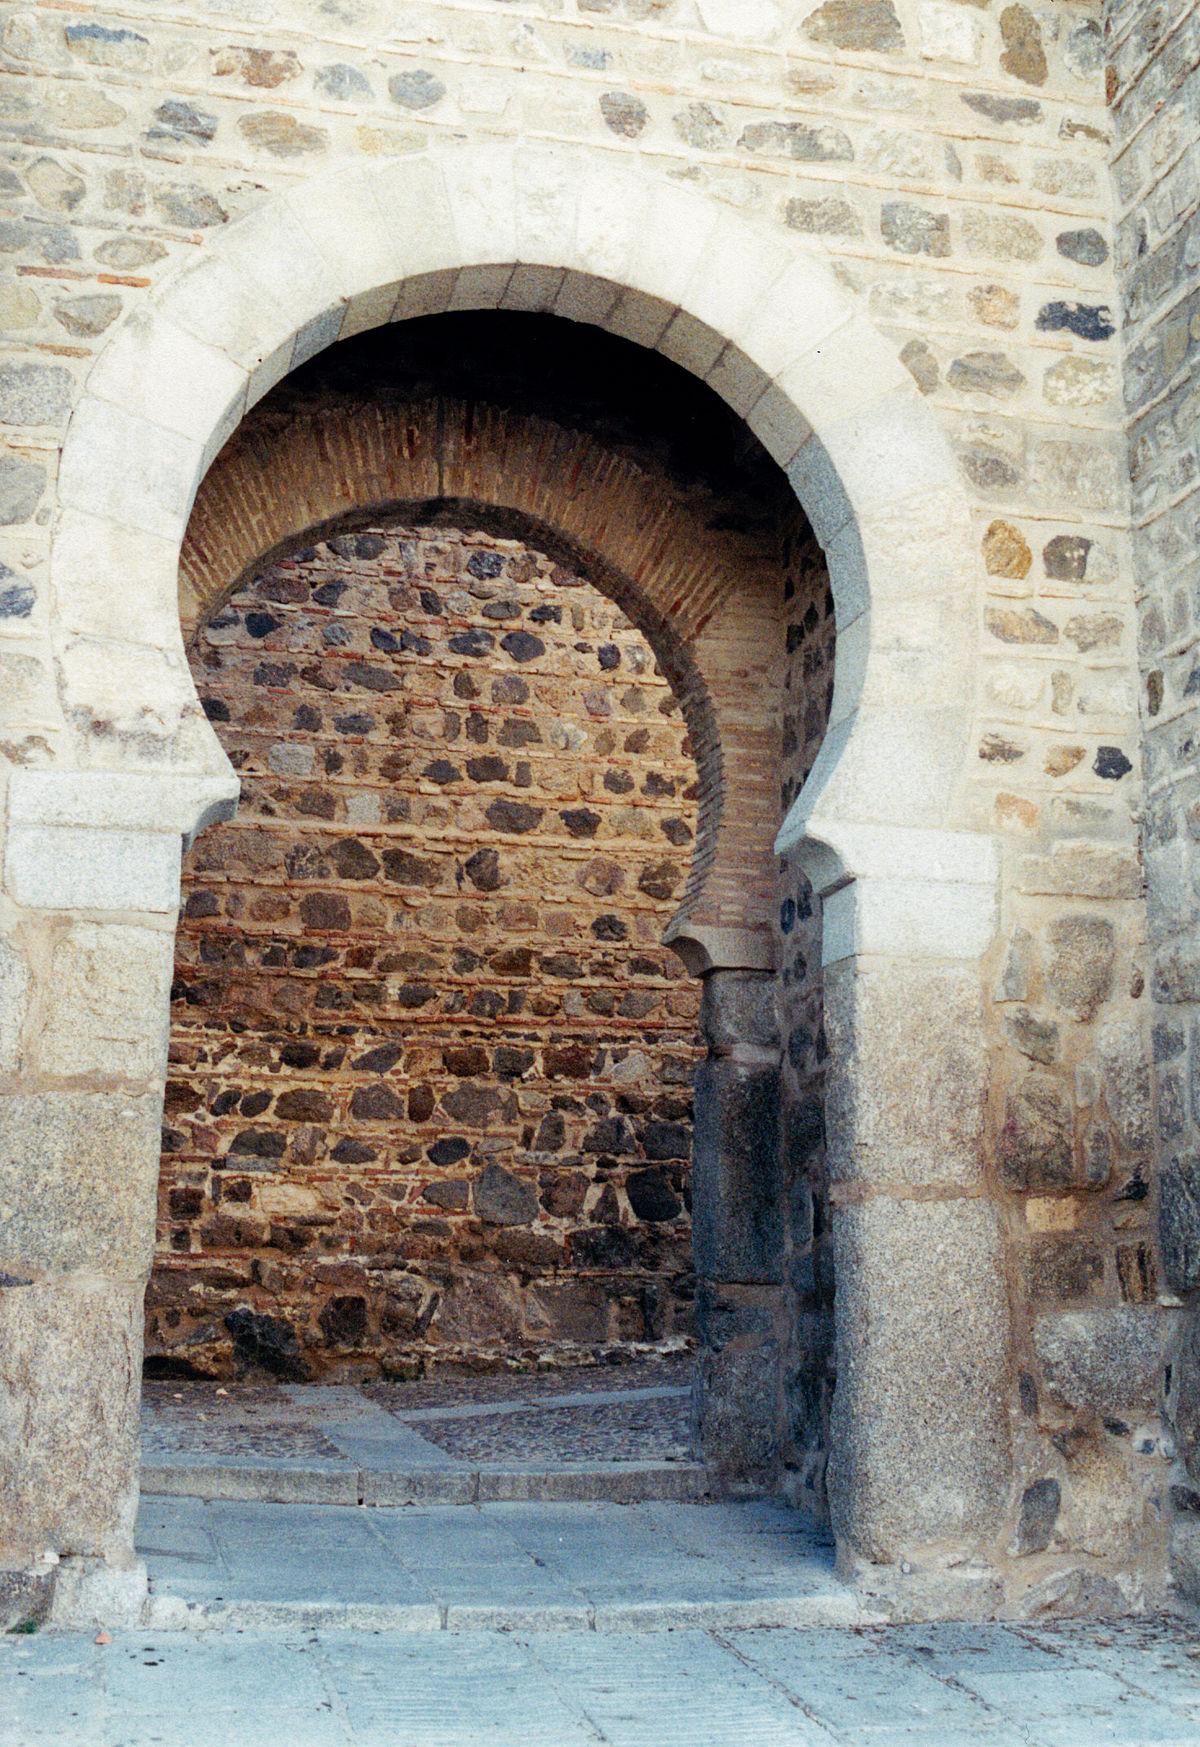 Puerta de alc ntara wikidata for Porte french to english